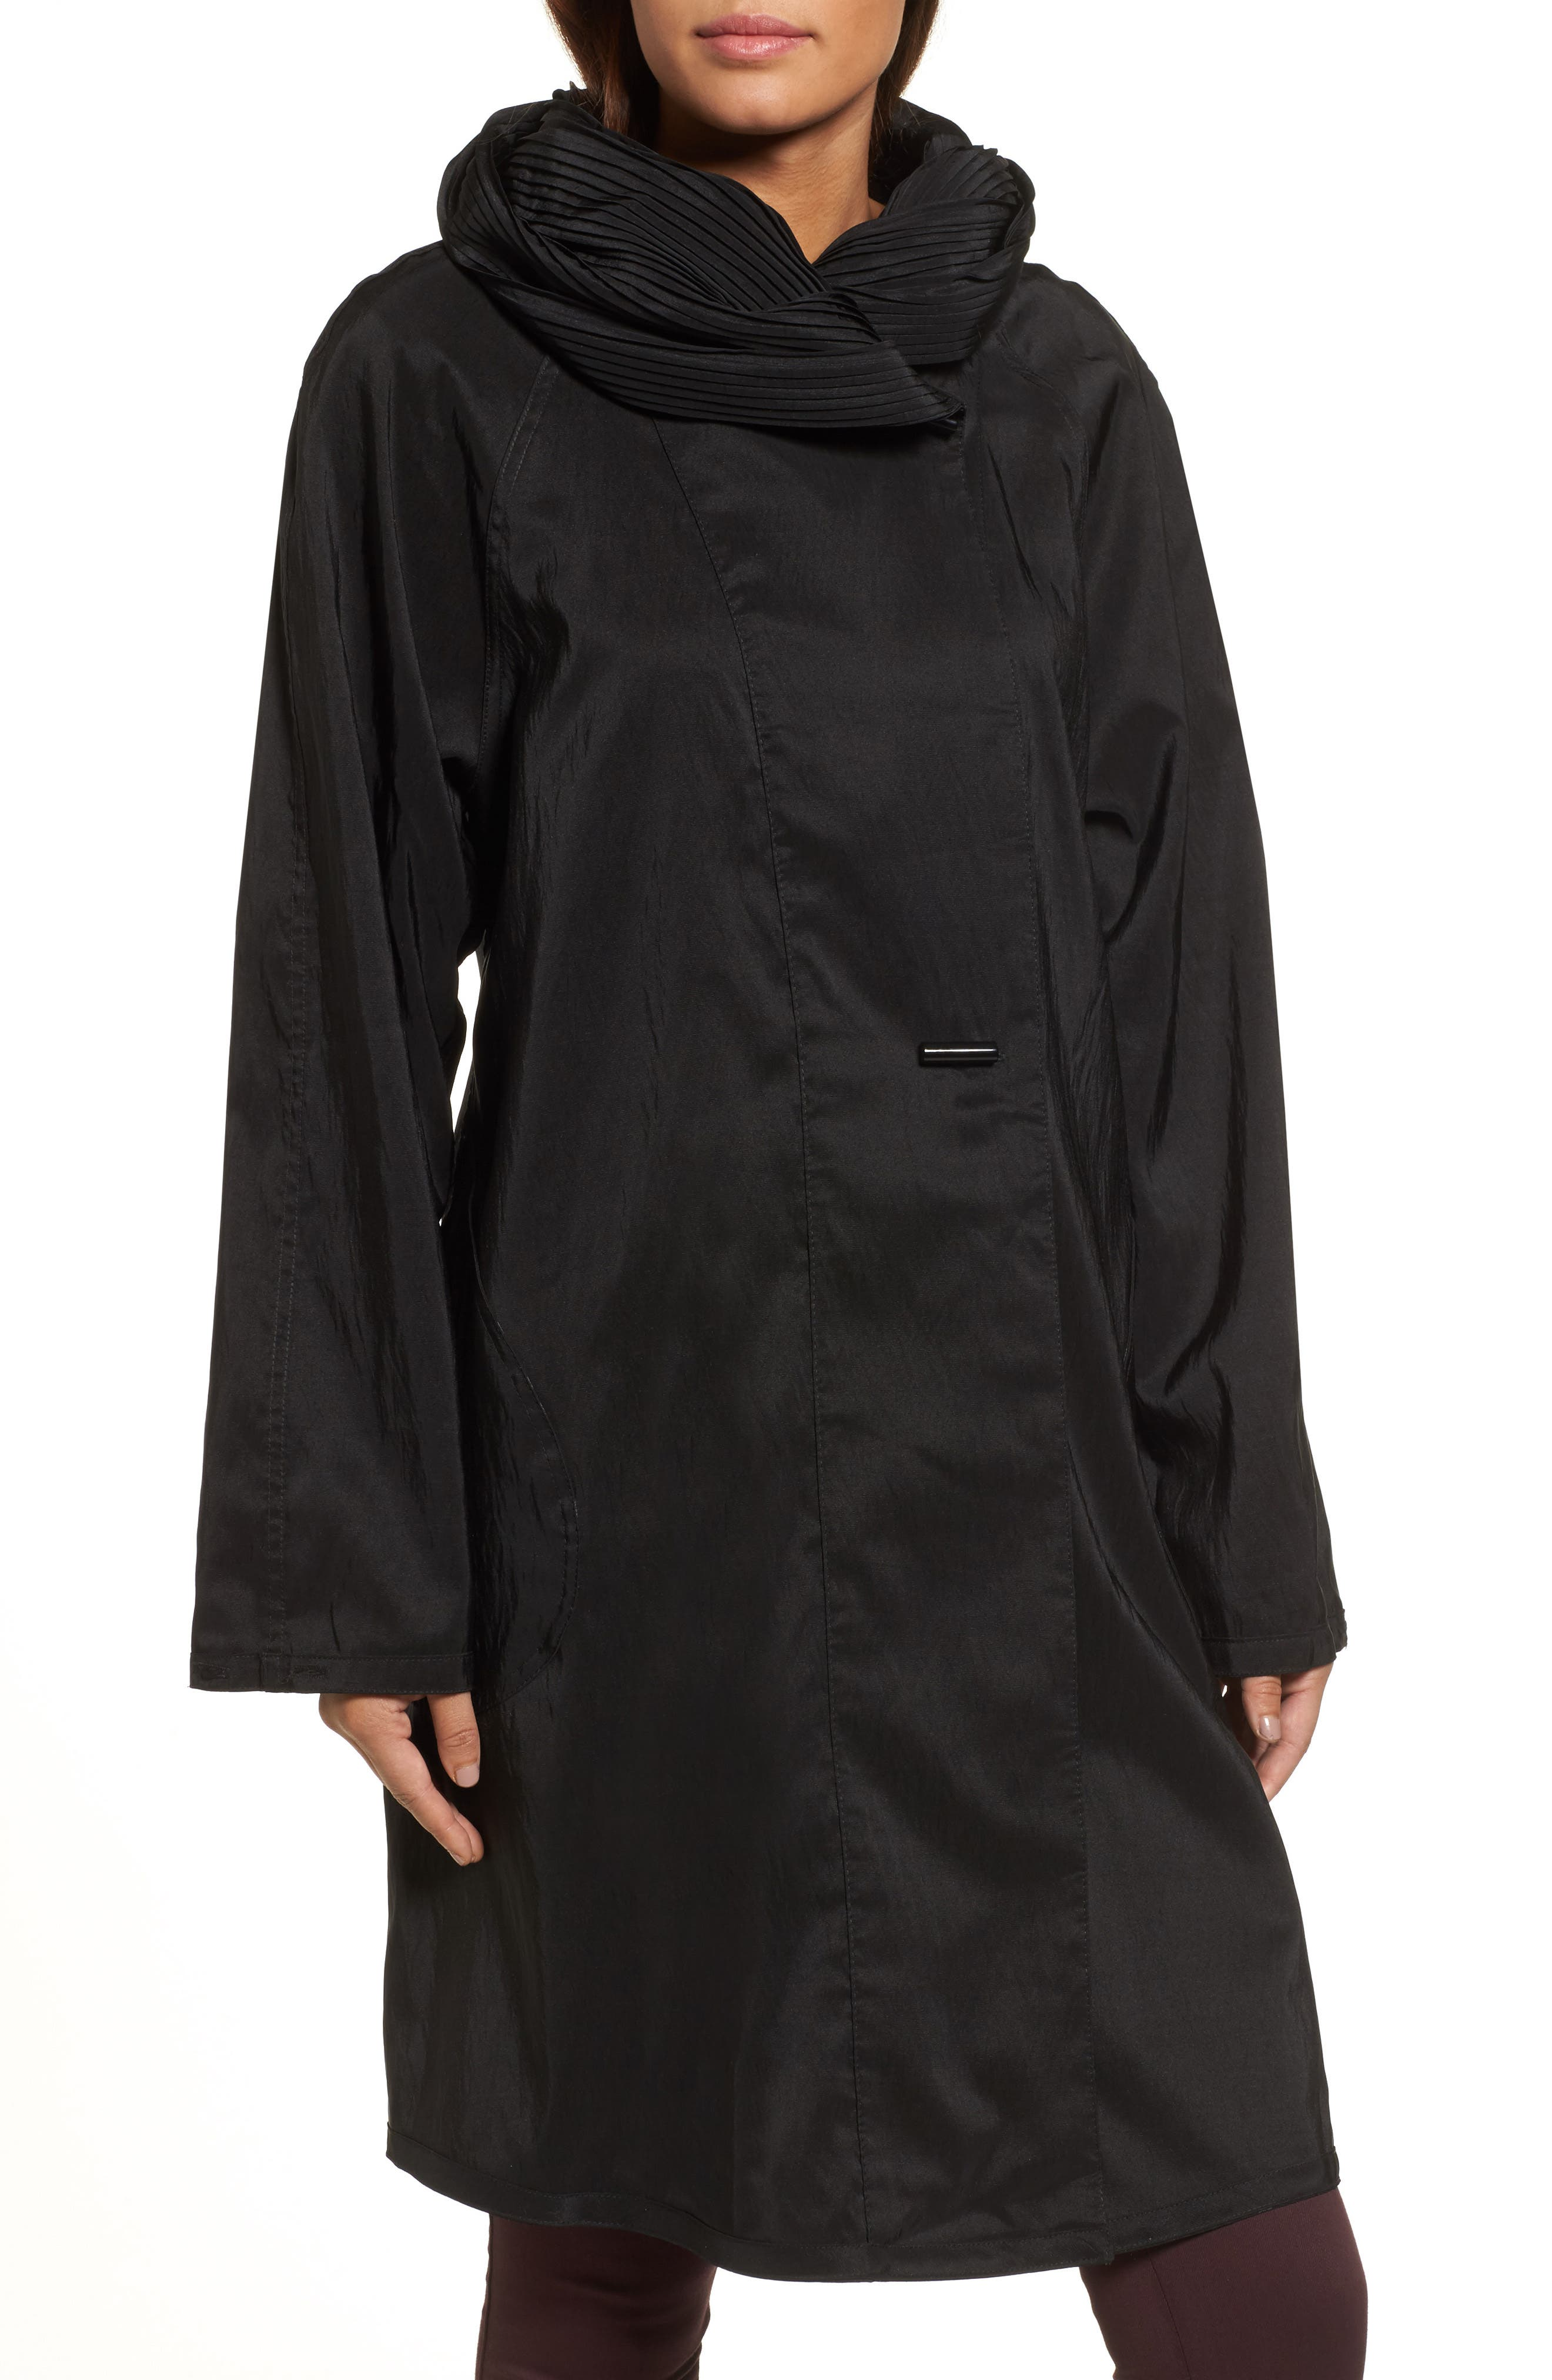 'Donatella' Reversible Dot Pleat Hood Packable Travel Coat,                             Alternate thumbnail 5, color,                             017